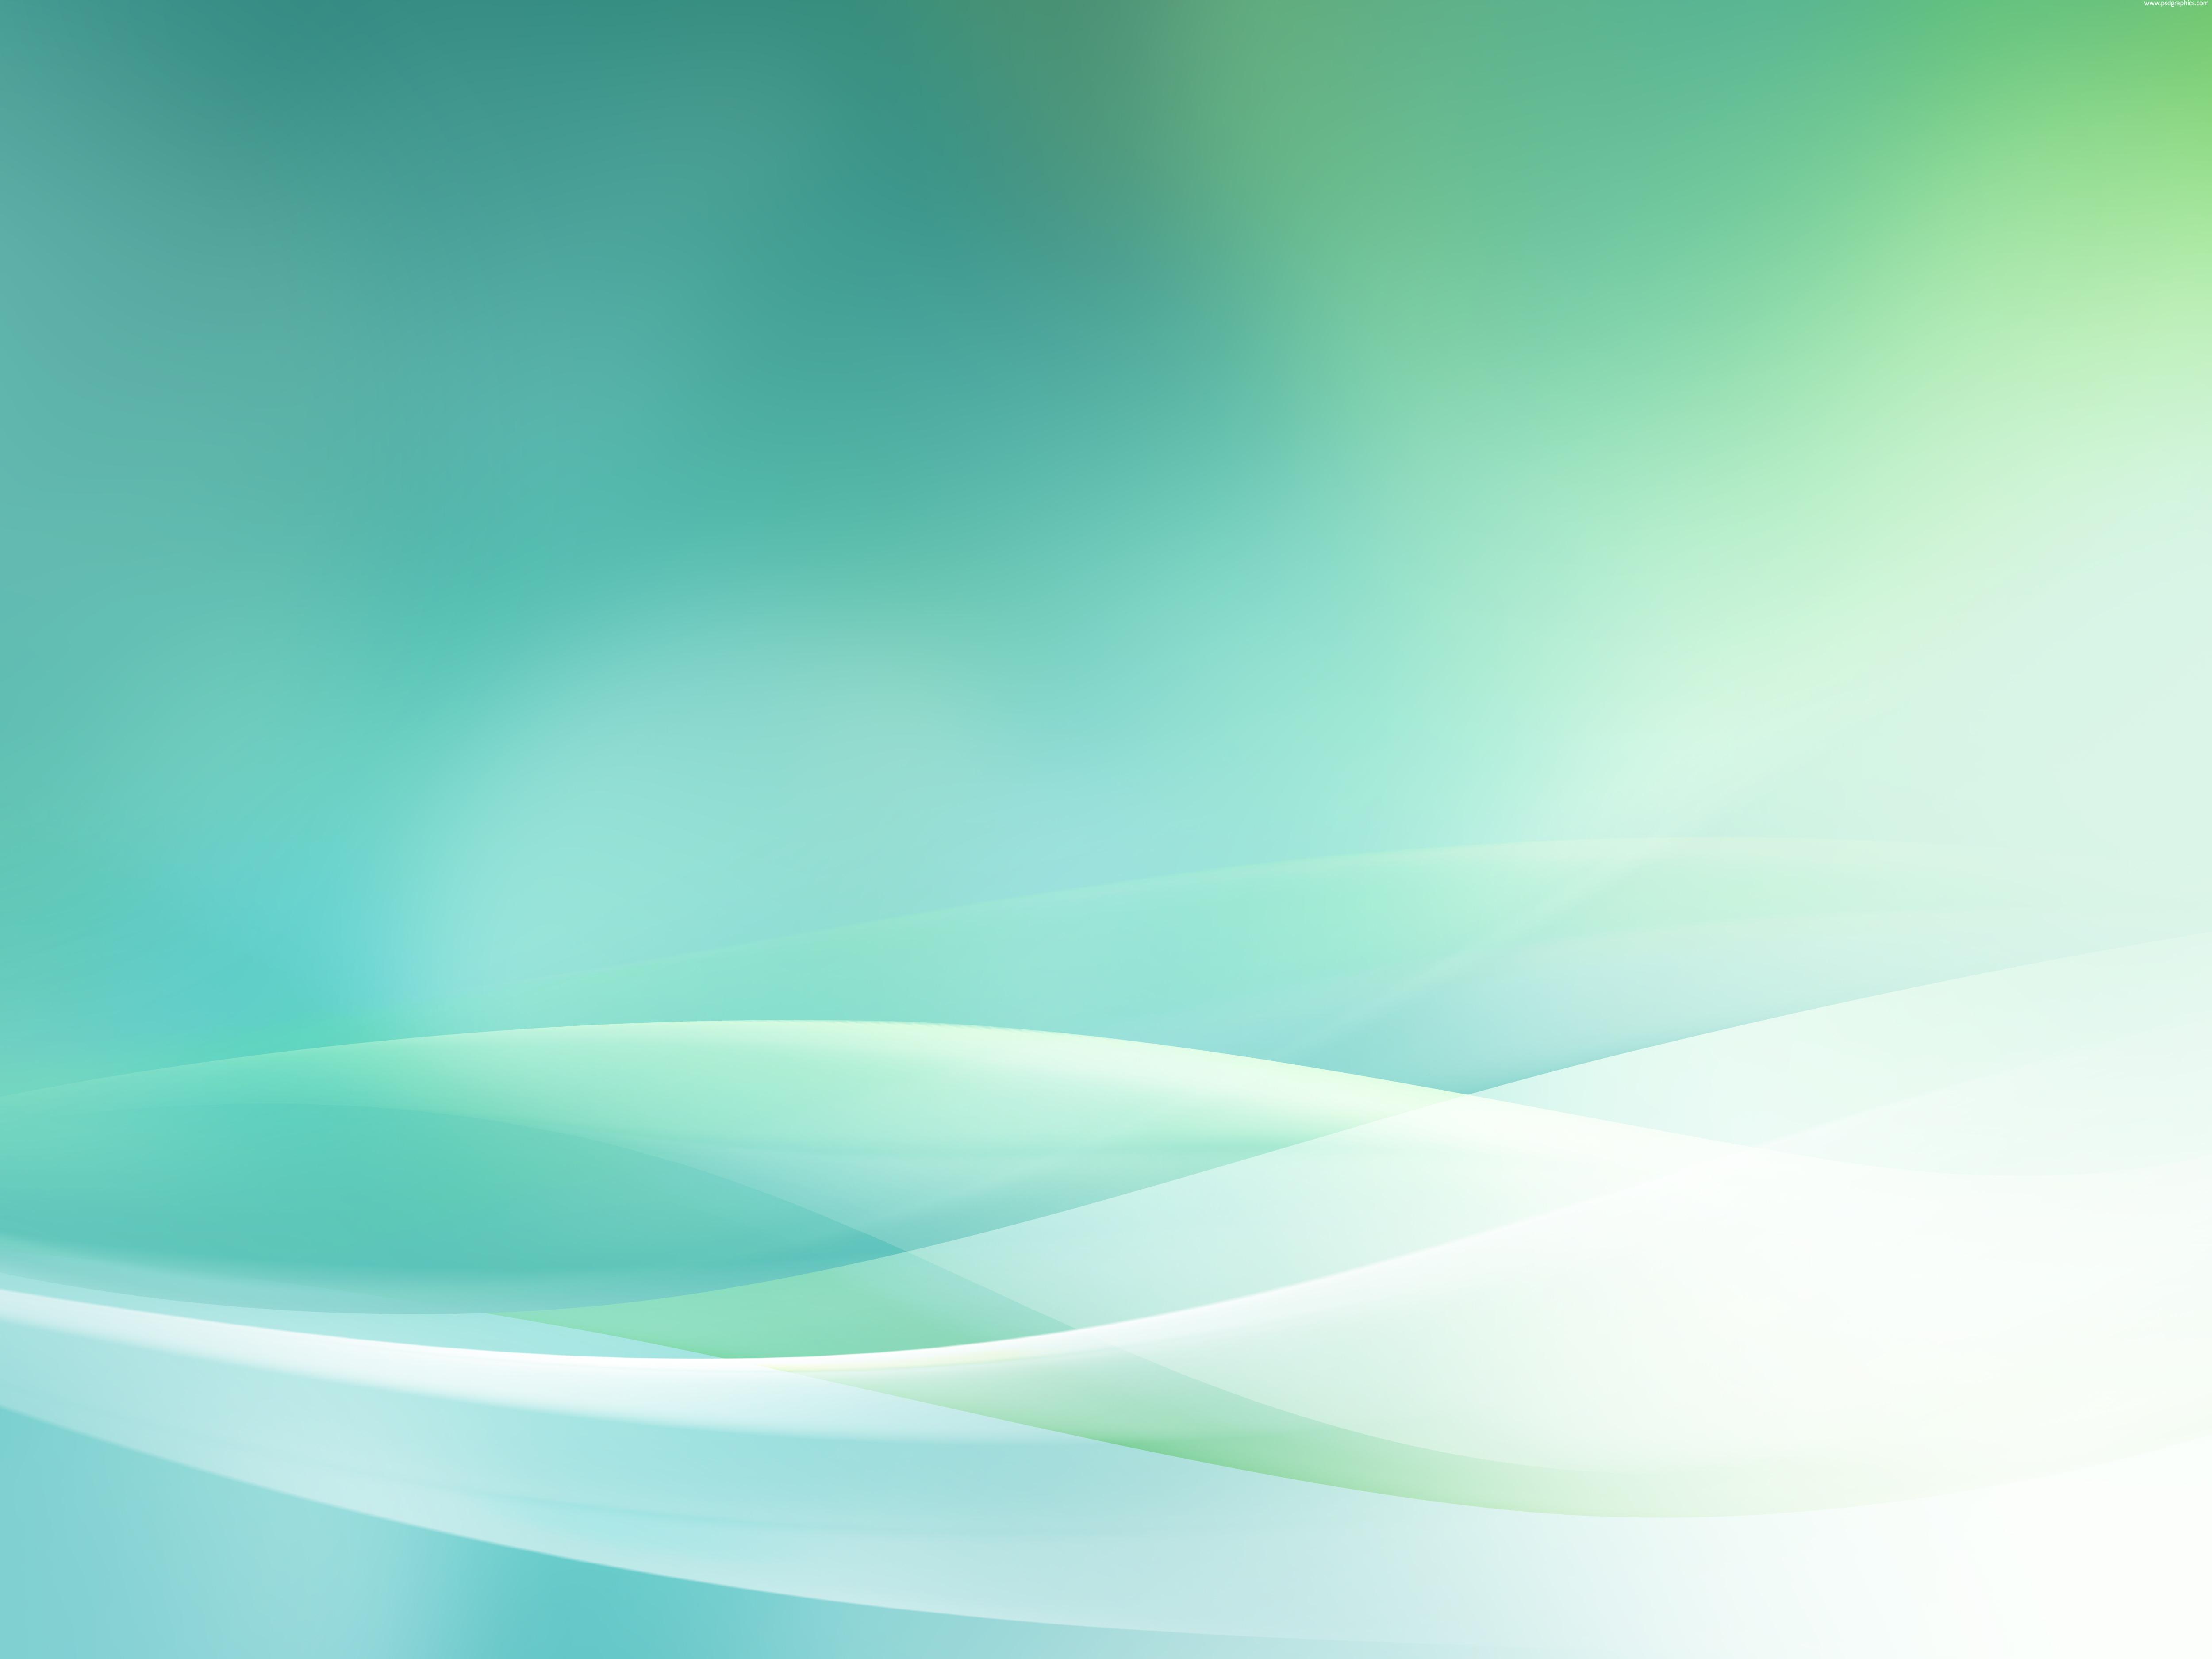 Blue Green 5000x3750